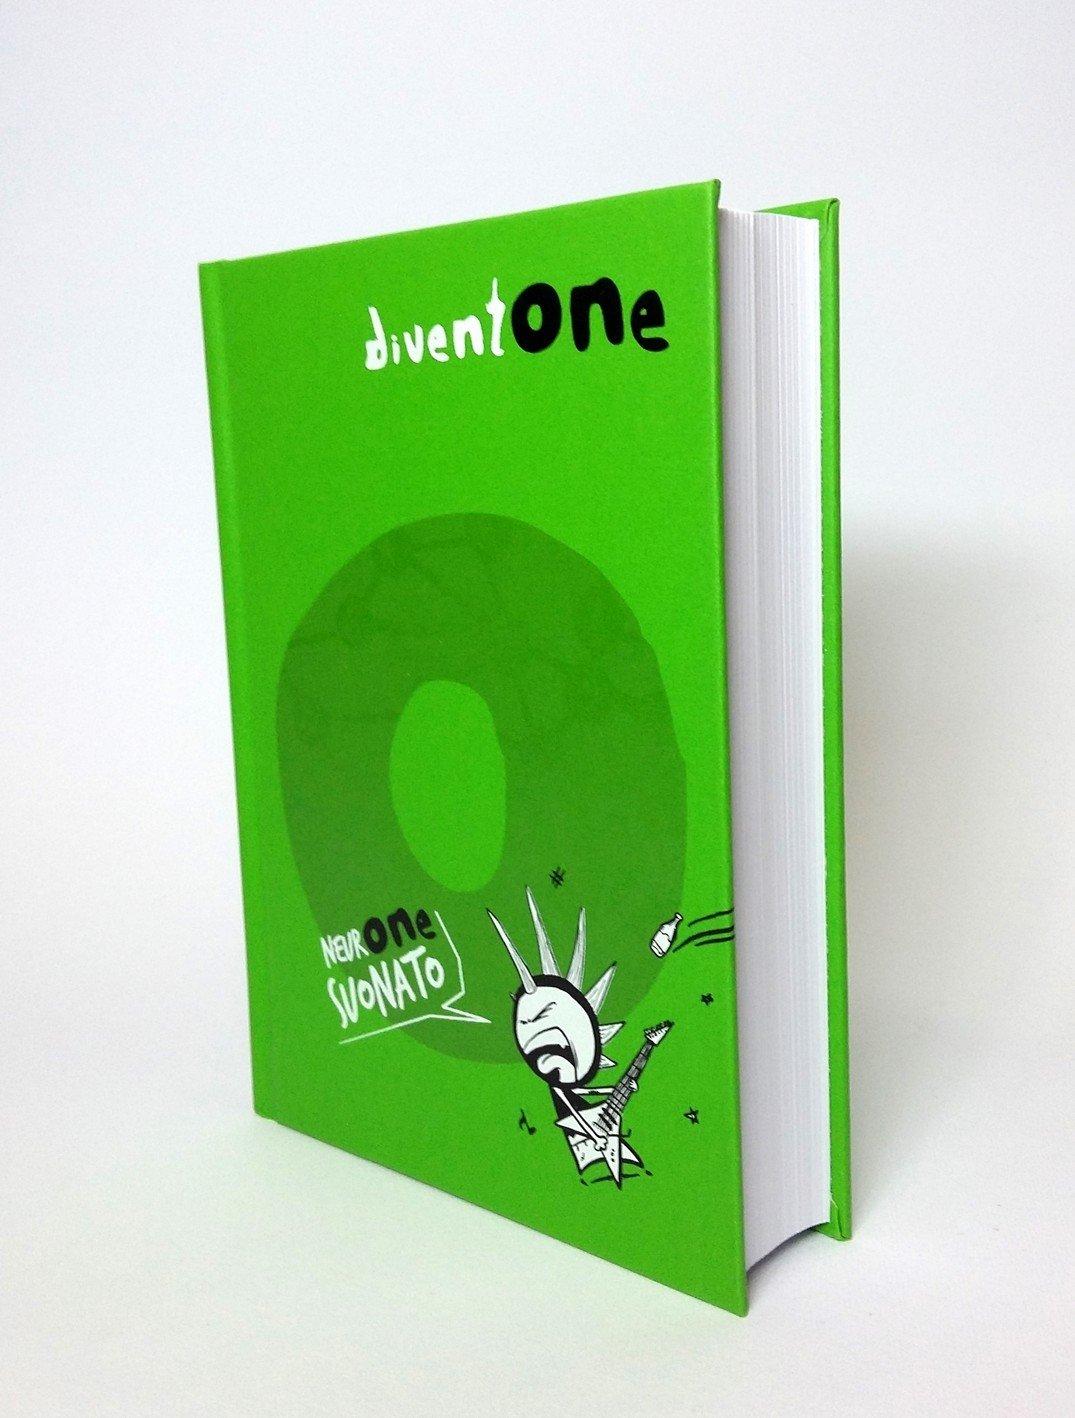 Seven Diventone Diario Pocket 16 mesi Scuola (Verde)